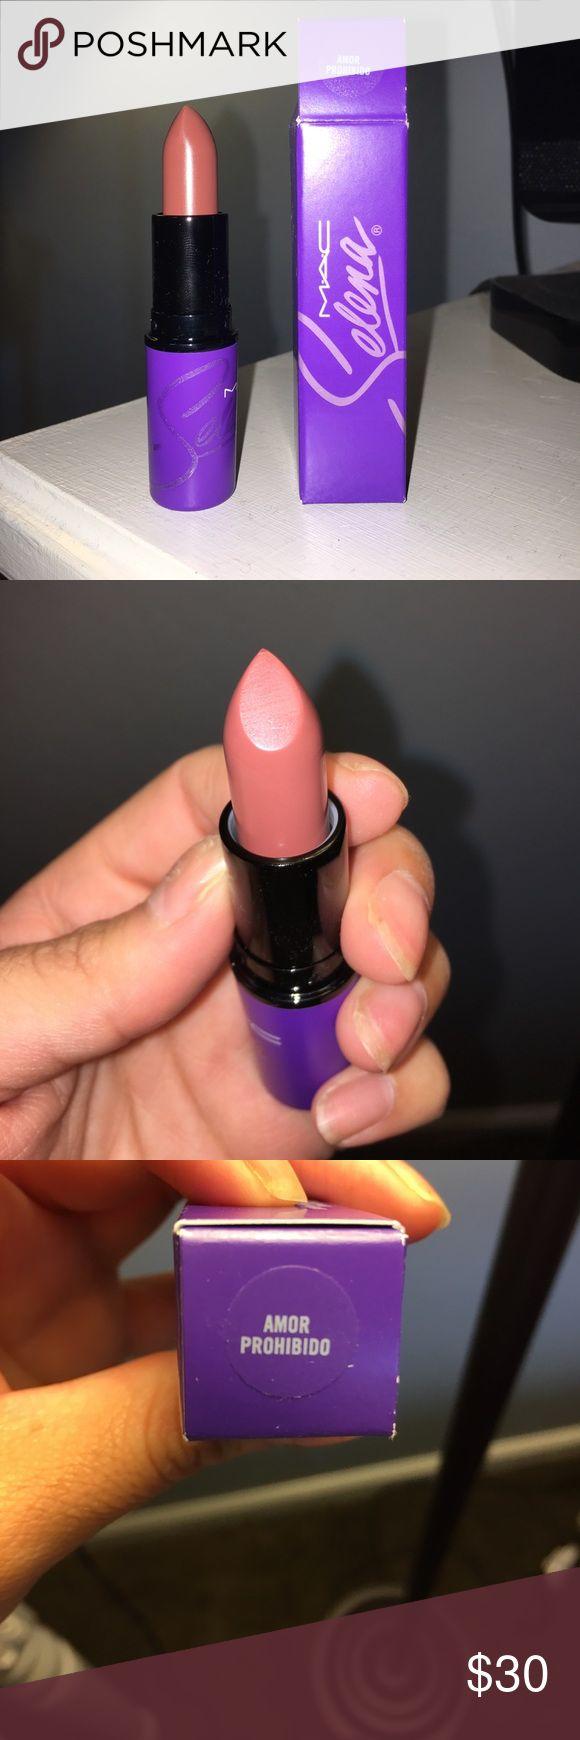 MAC Selena - Amor Prohibido Lipstick NWT, I have two available! Get this rare Mac Selena lipstick! Beautiful glazed nude. Perfect for everyday wear! MAC Cosmetics Makeup Lipstick